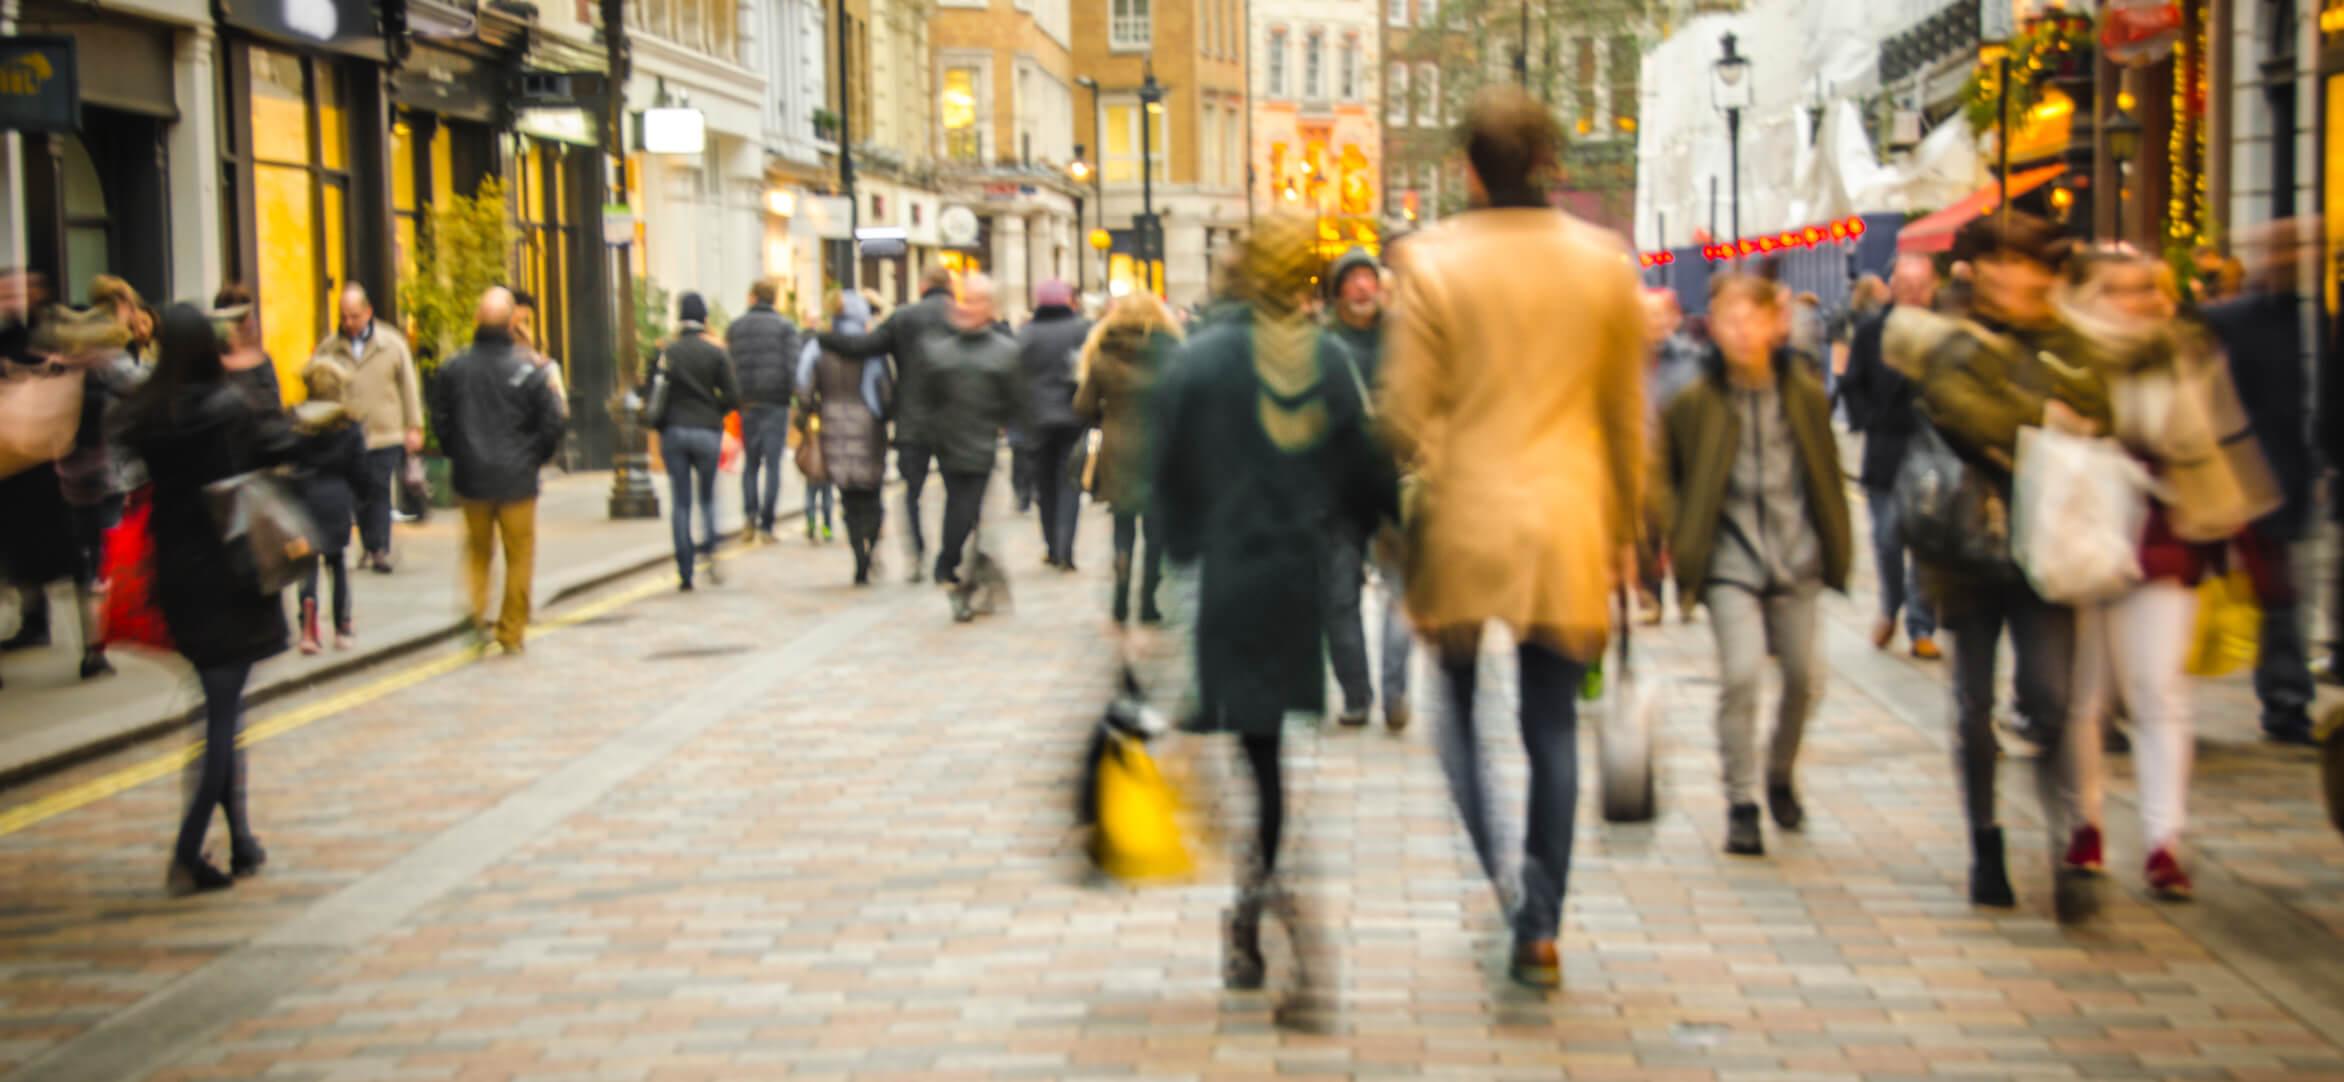 People walking downtown.